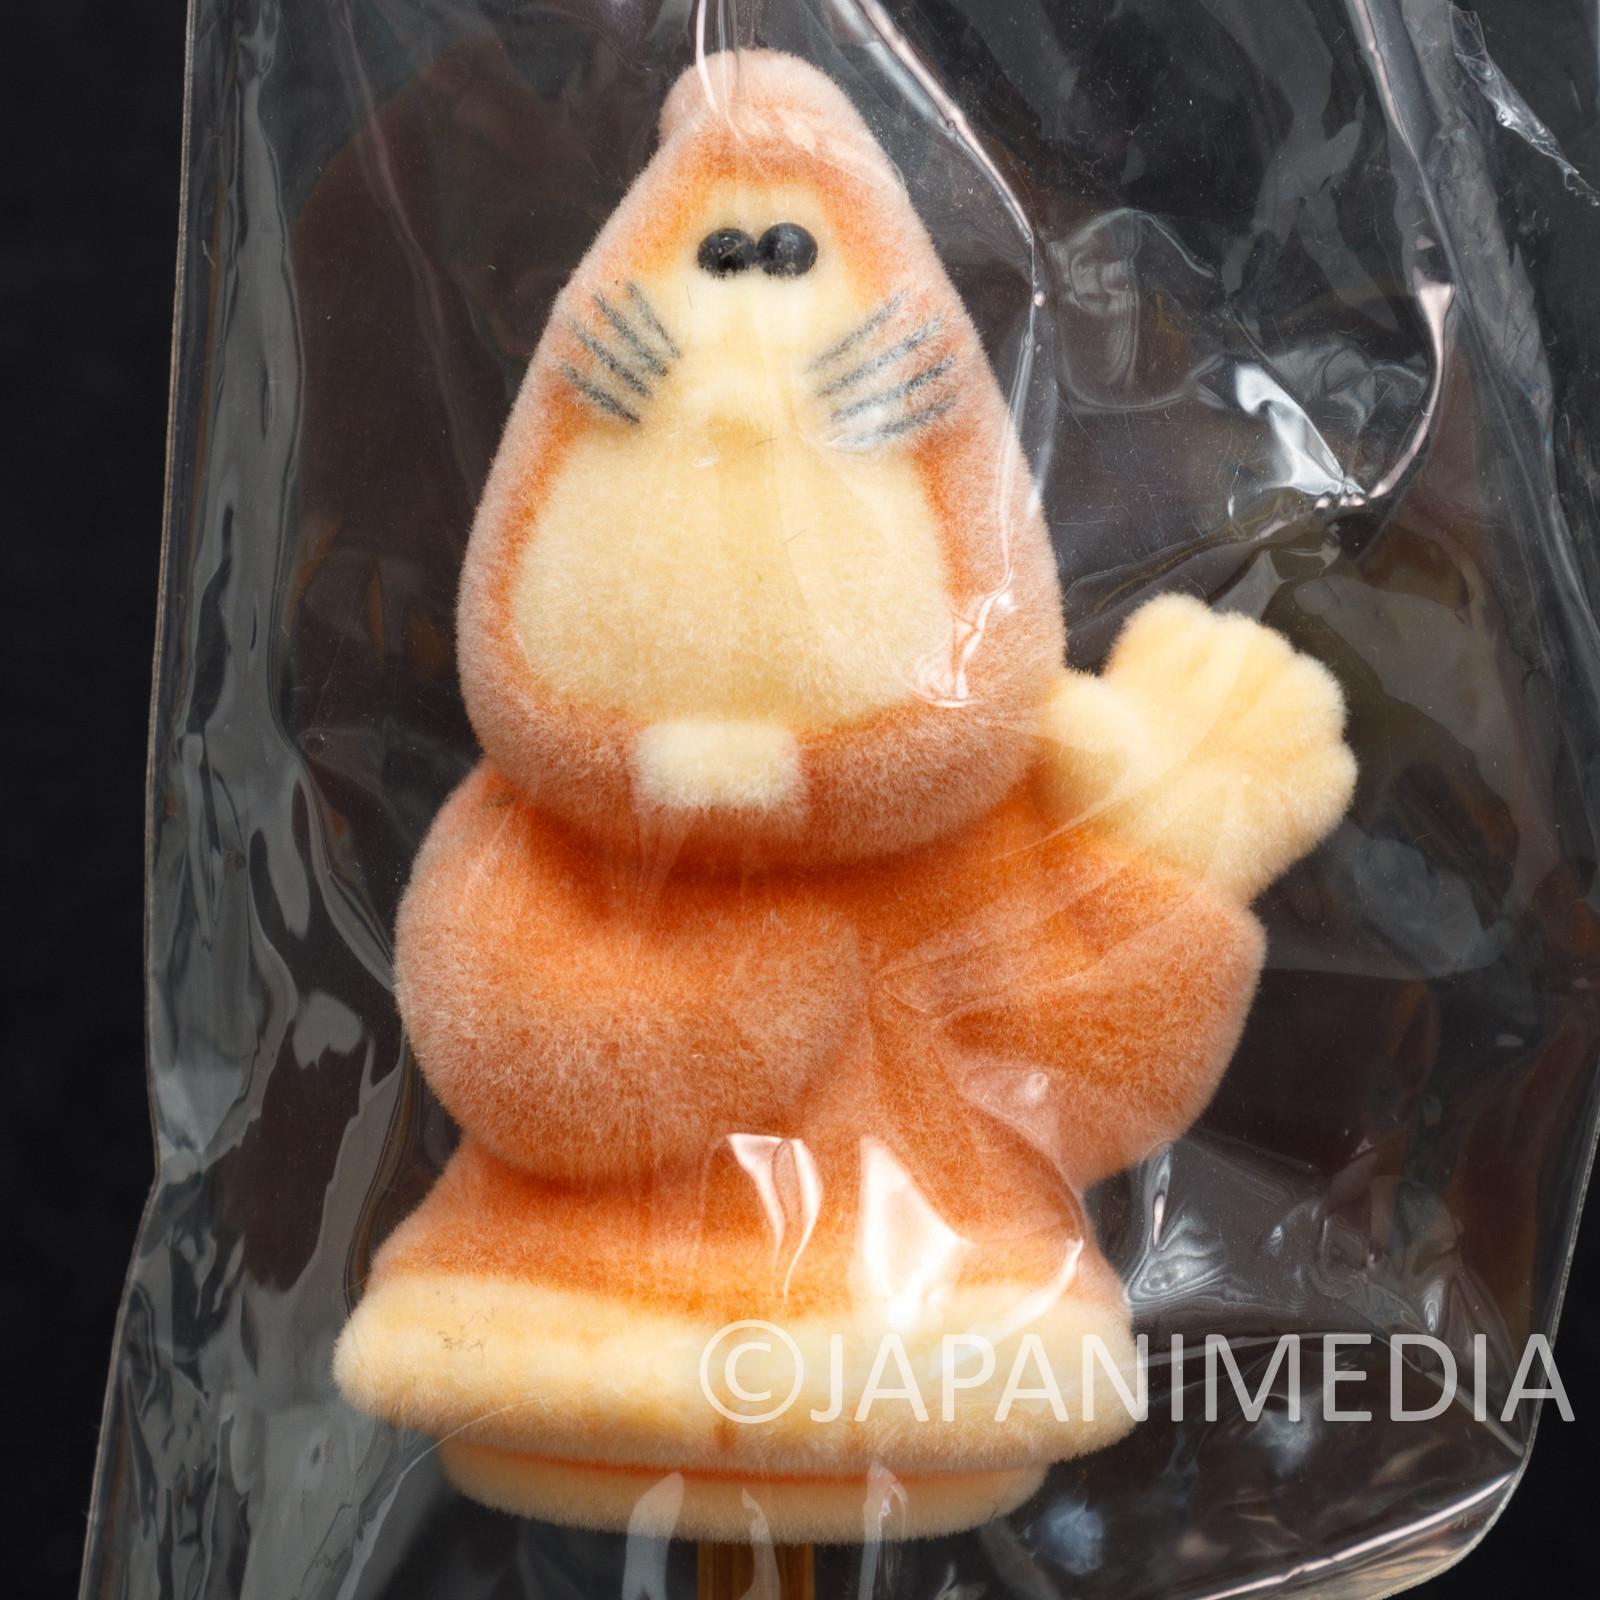 Retro GeGeGe no Kitaro Nezumi Otoko Figure Earpick Mizuki Pro JAPAN ANIME MANGA